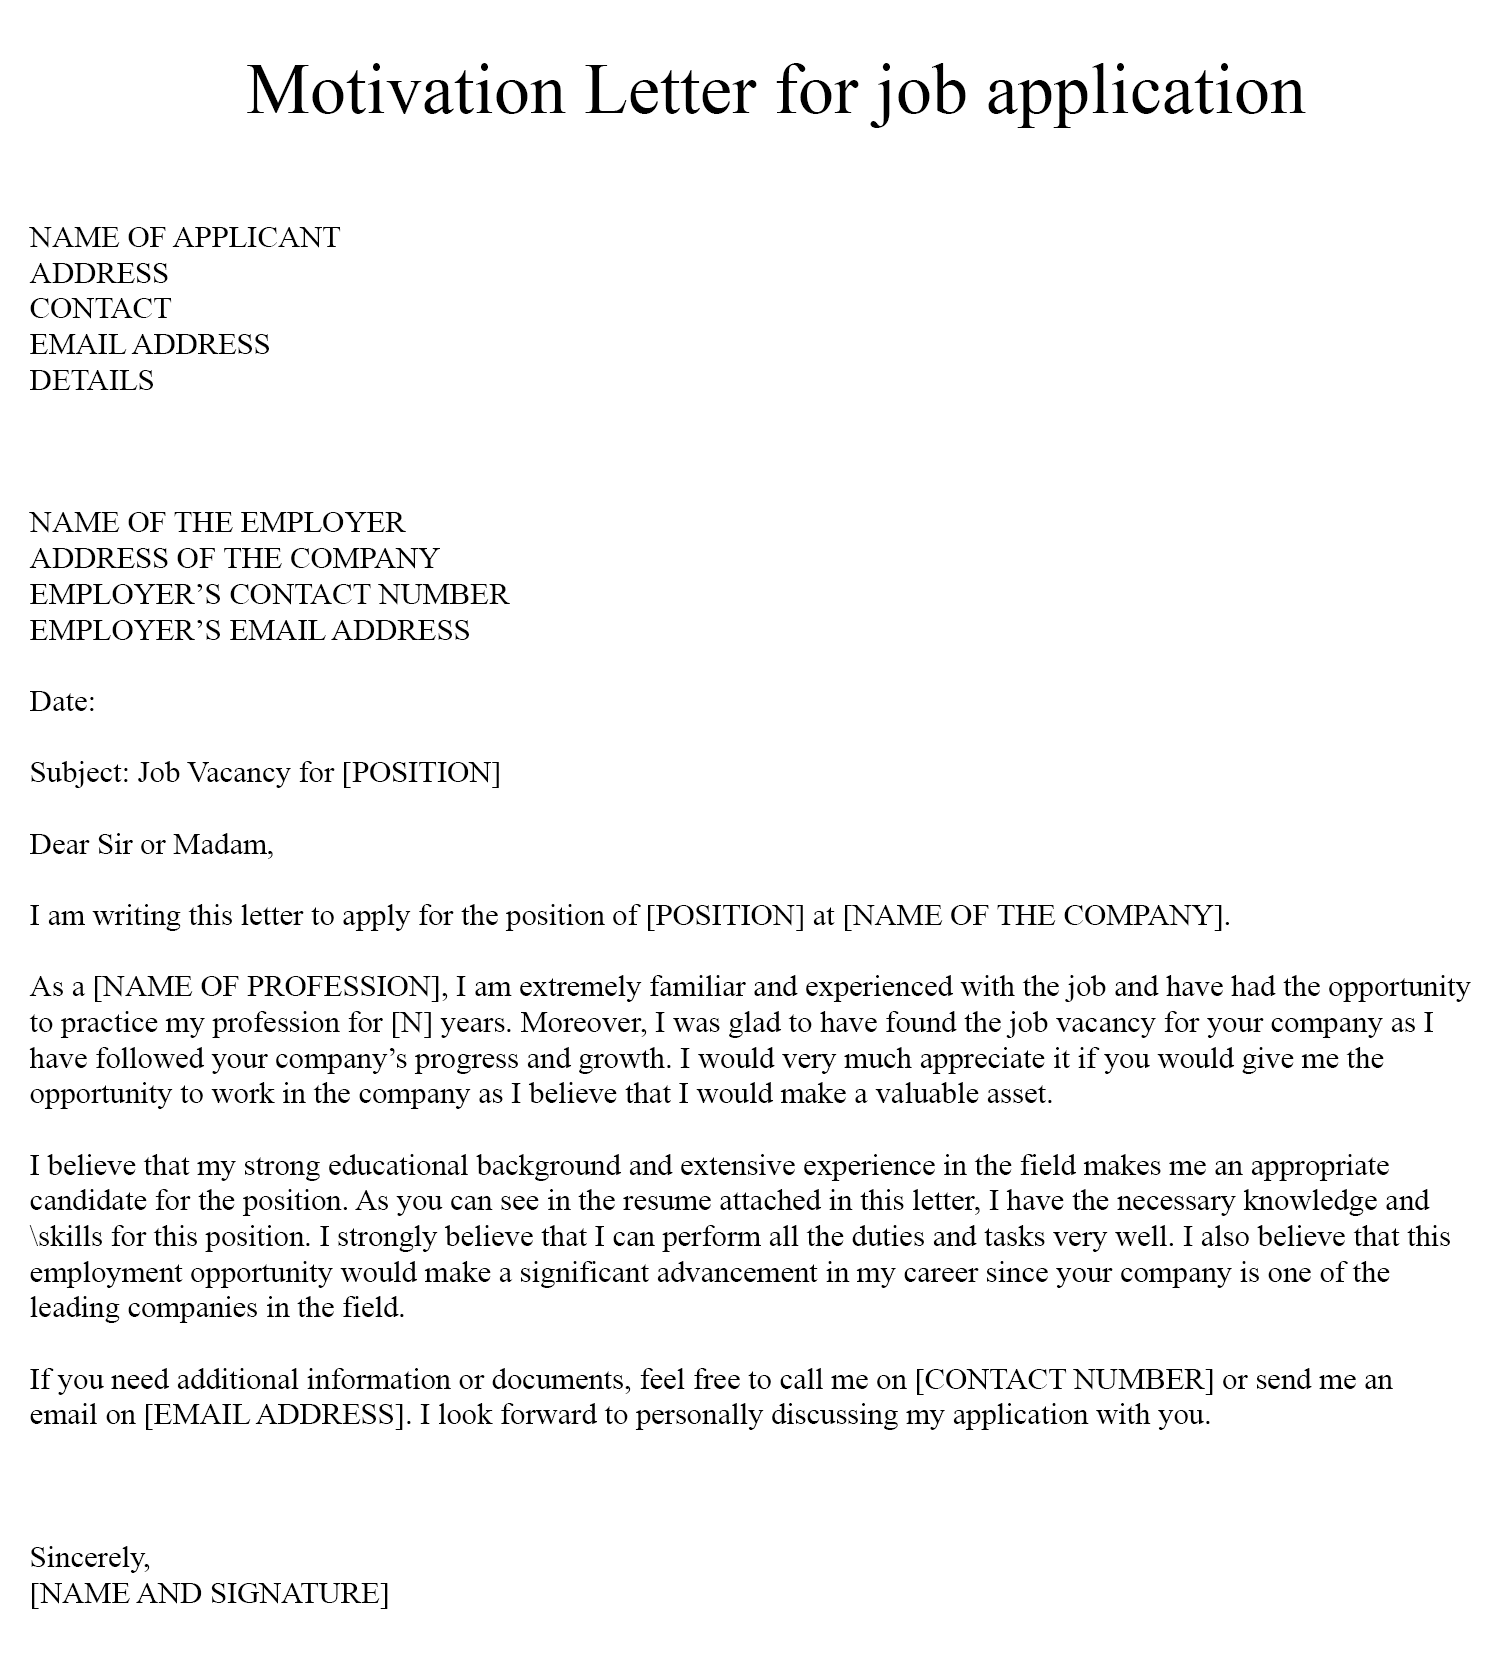 Motivation Letter for Job Example